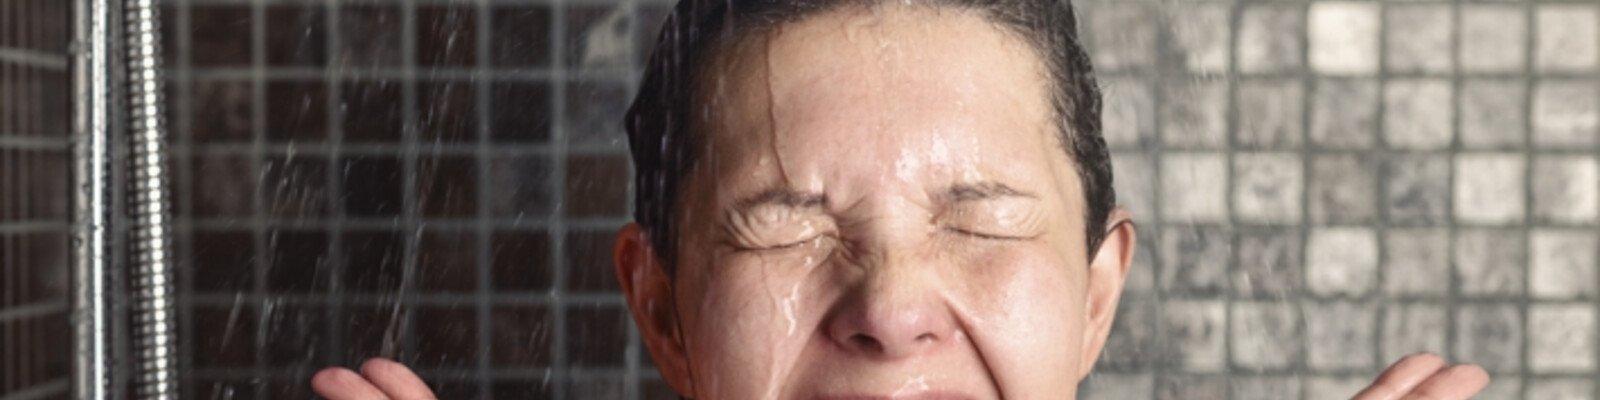 La douche du matin